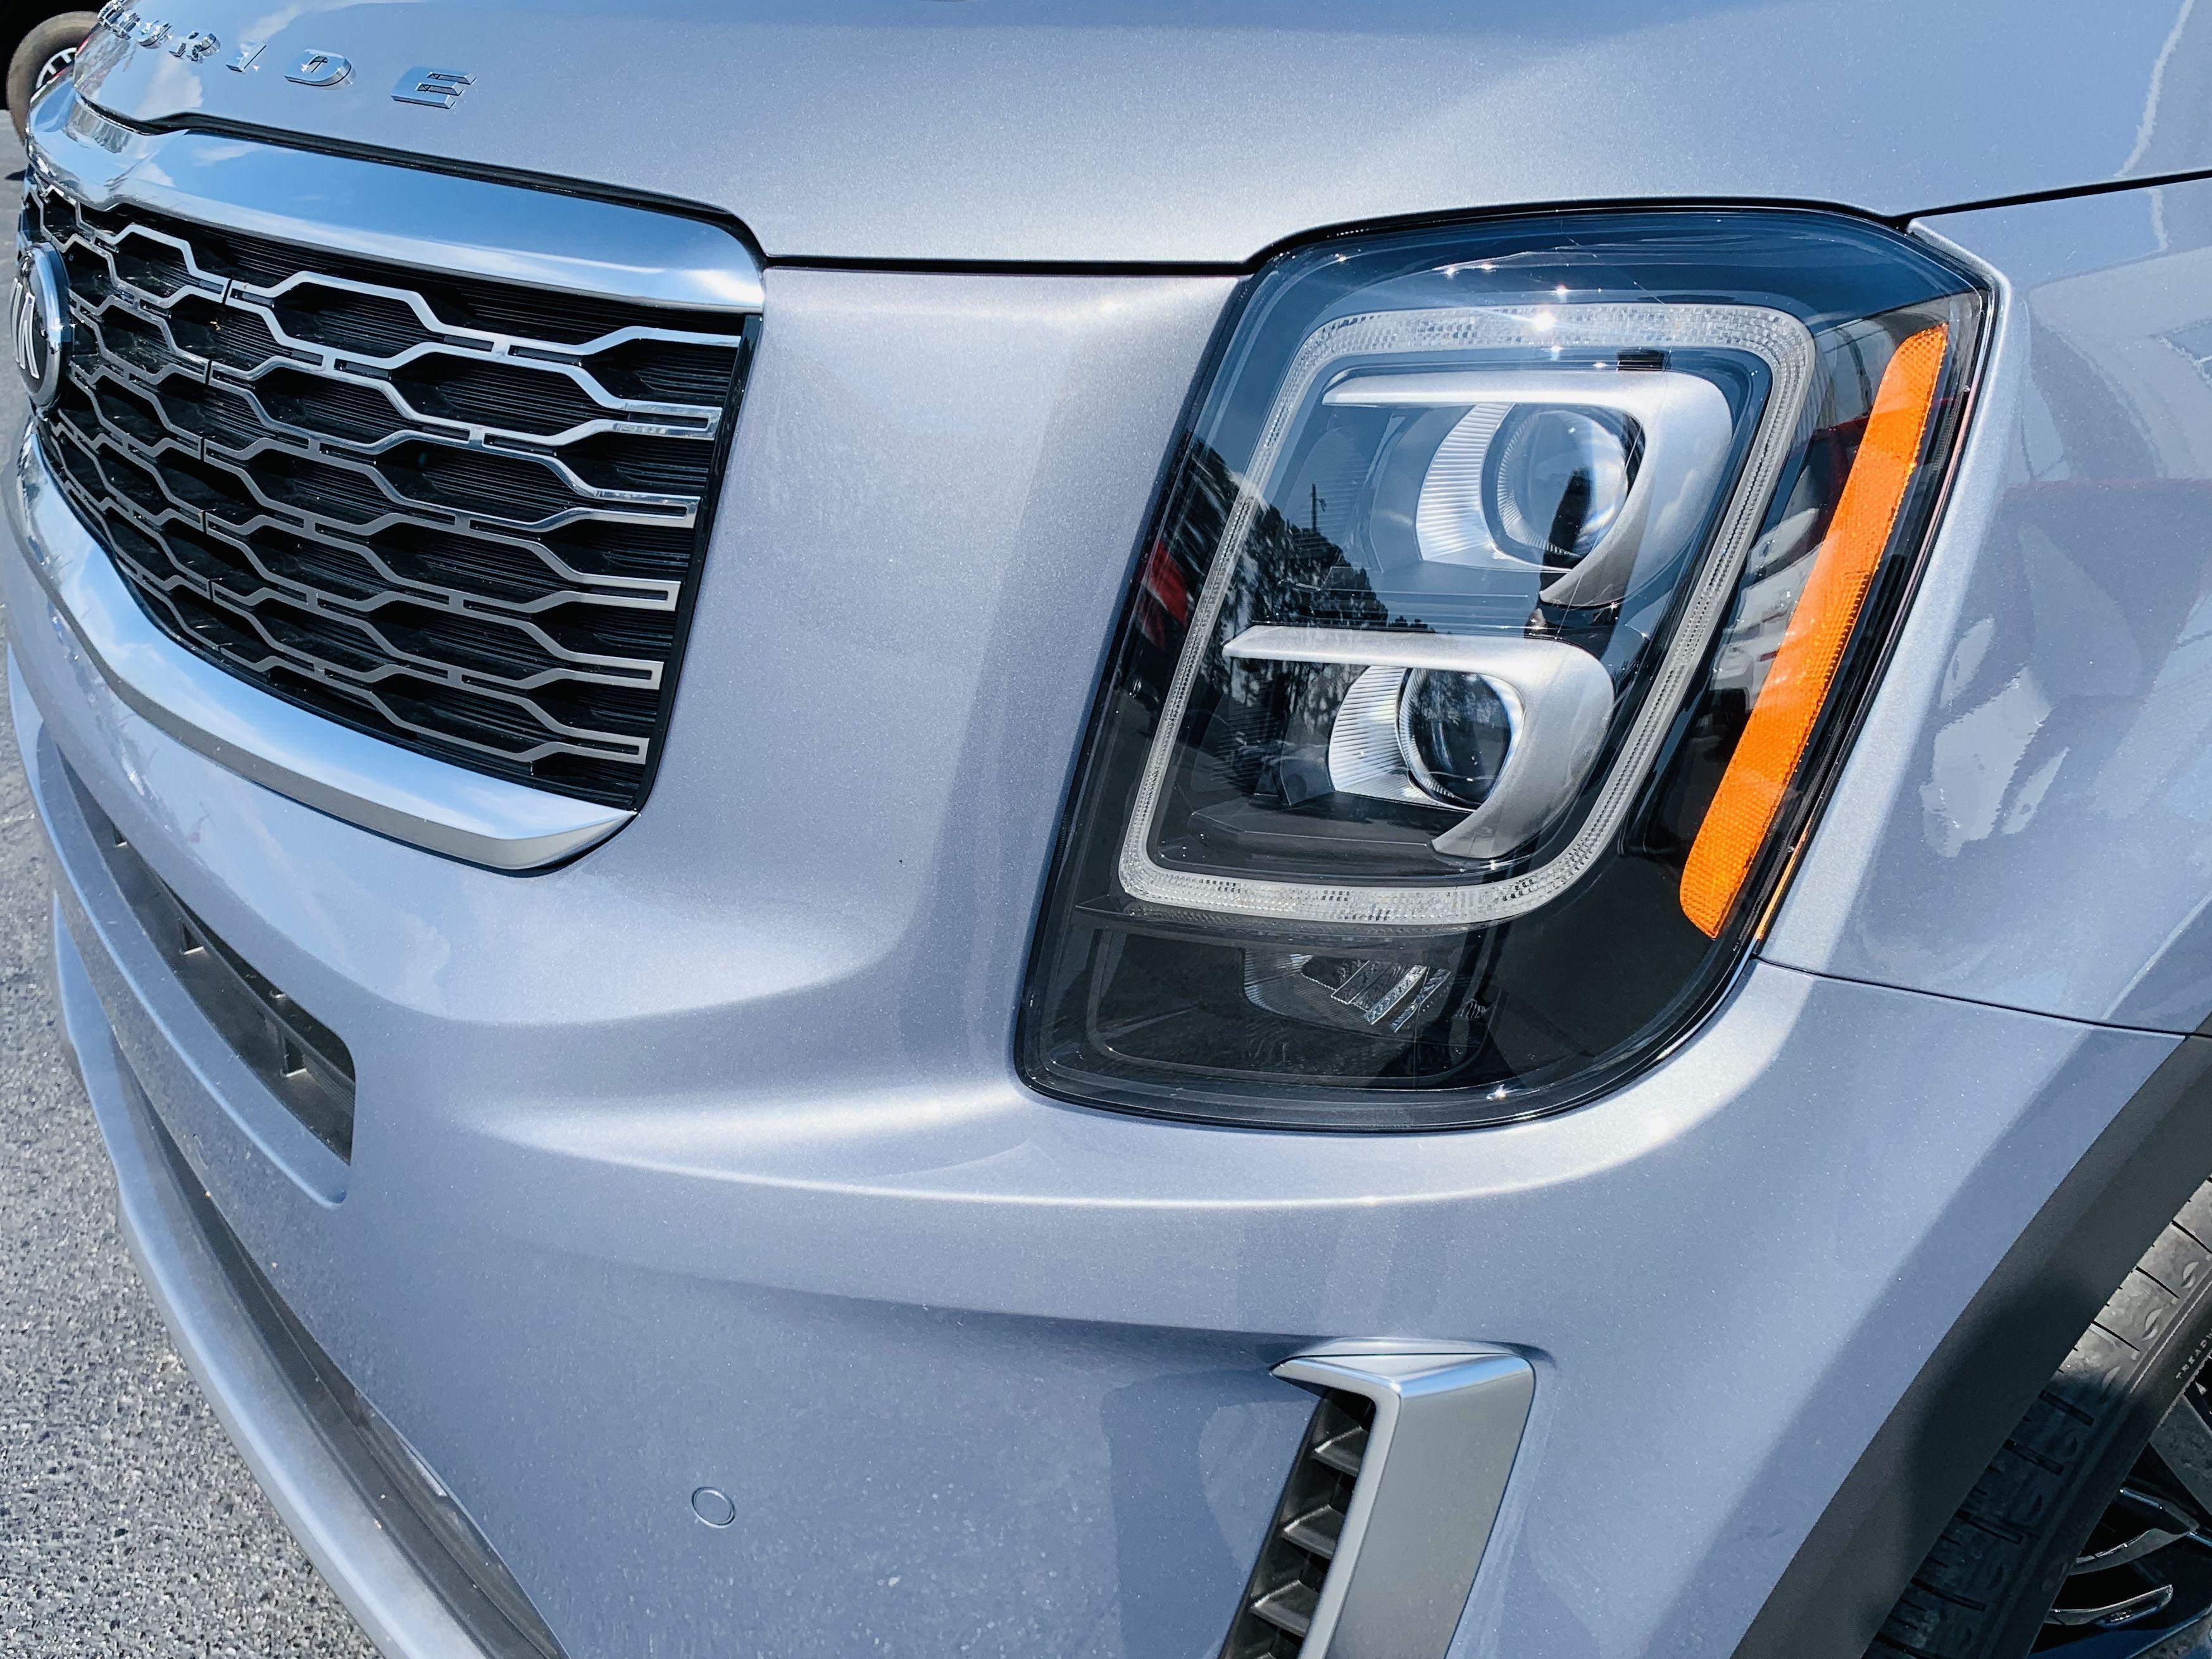 2020 Kia Telluride Everlasting Silver Suv Trucks Kia Sedan